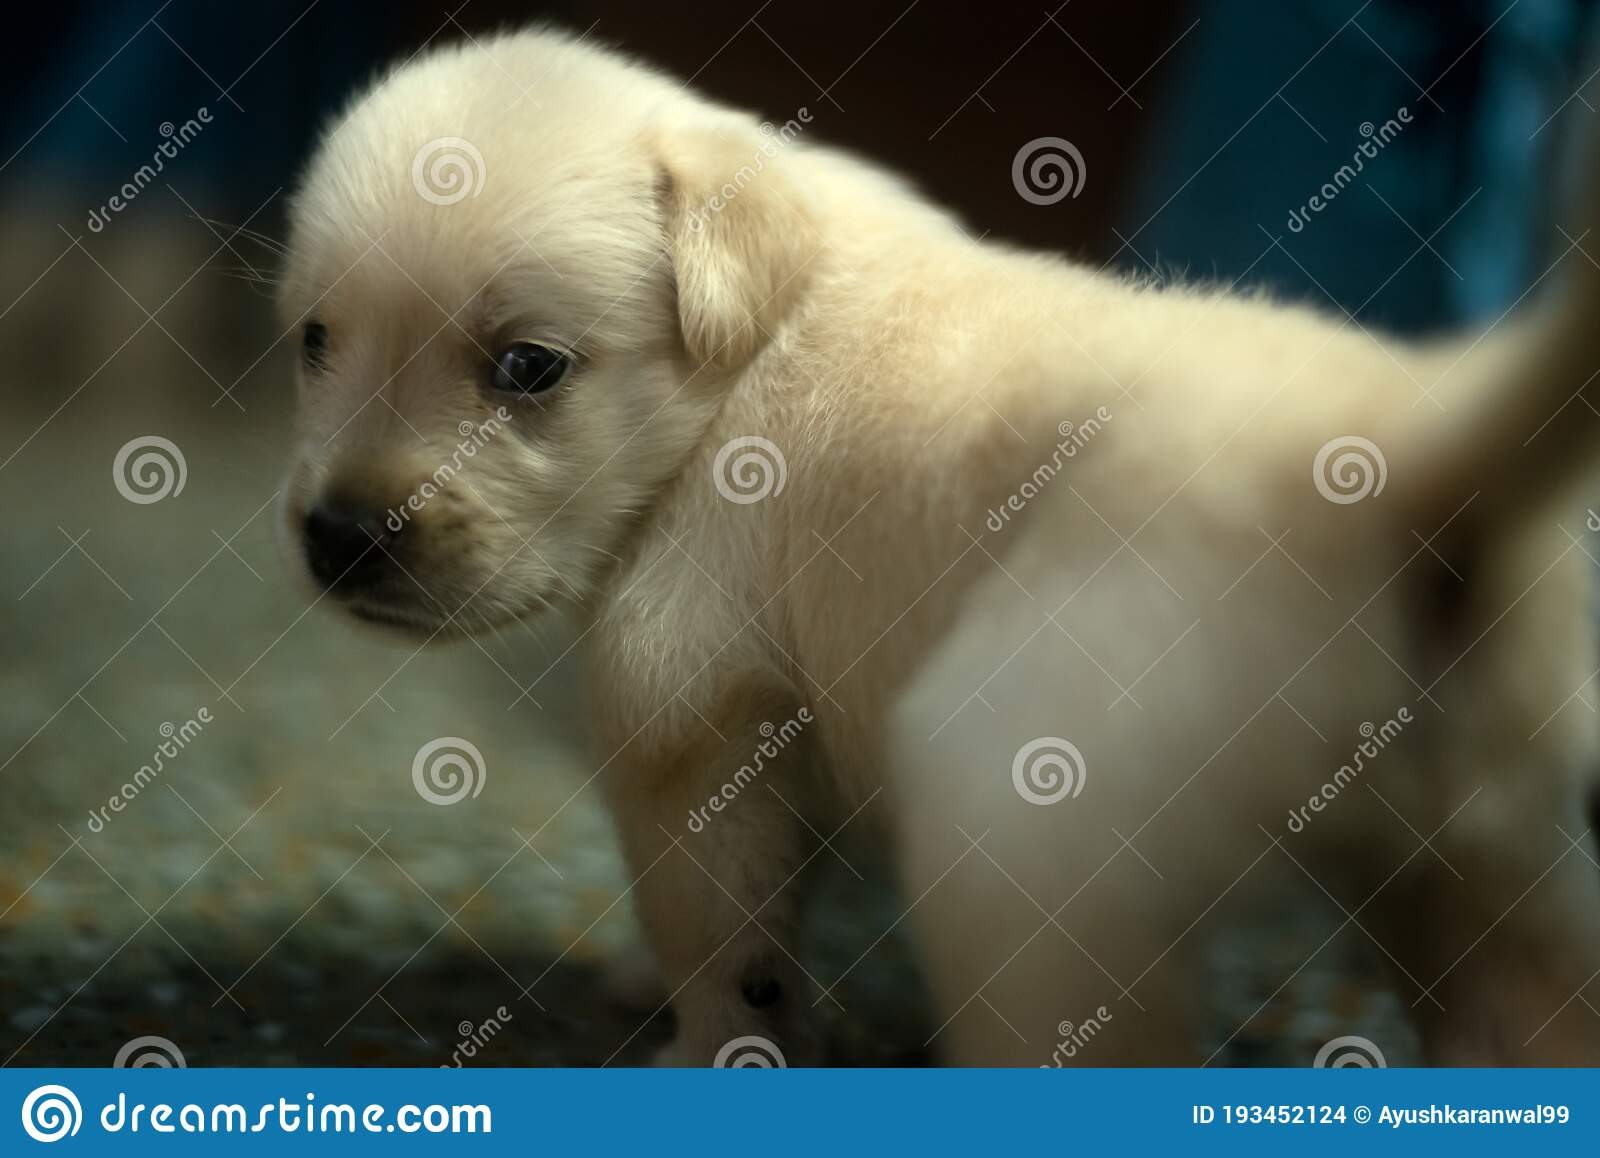 Cute Eyes Of Labrador Puppy Stock Photo Image Of Golden Macro 193452124